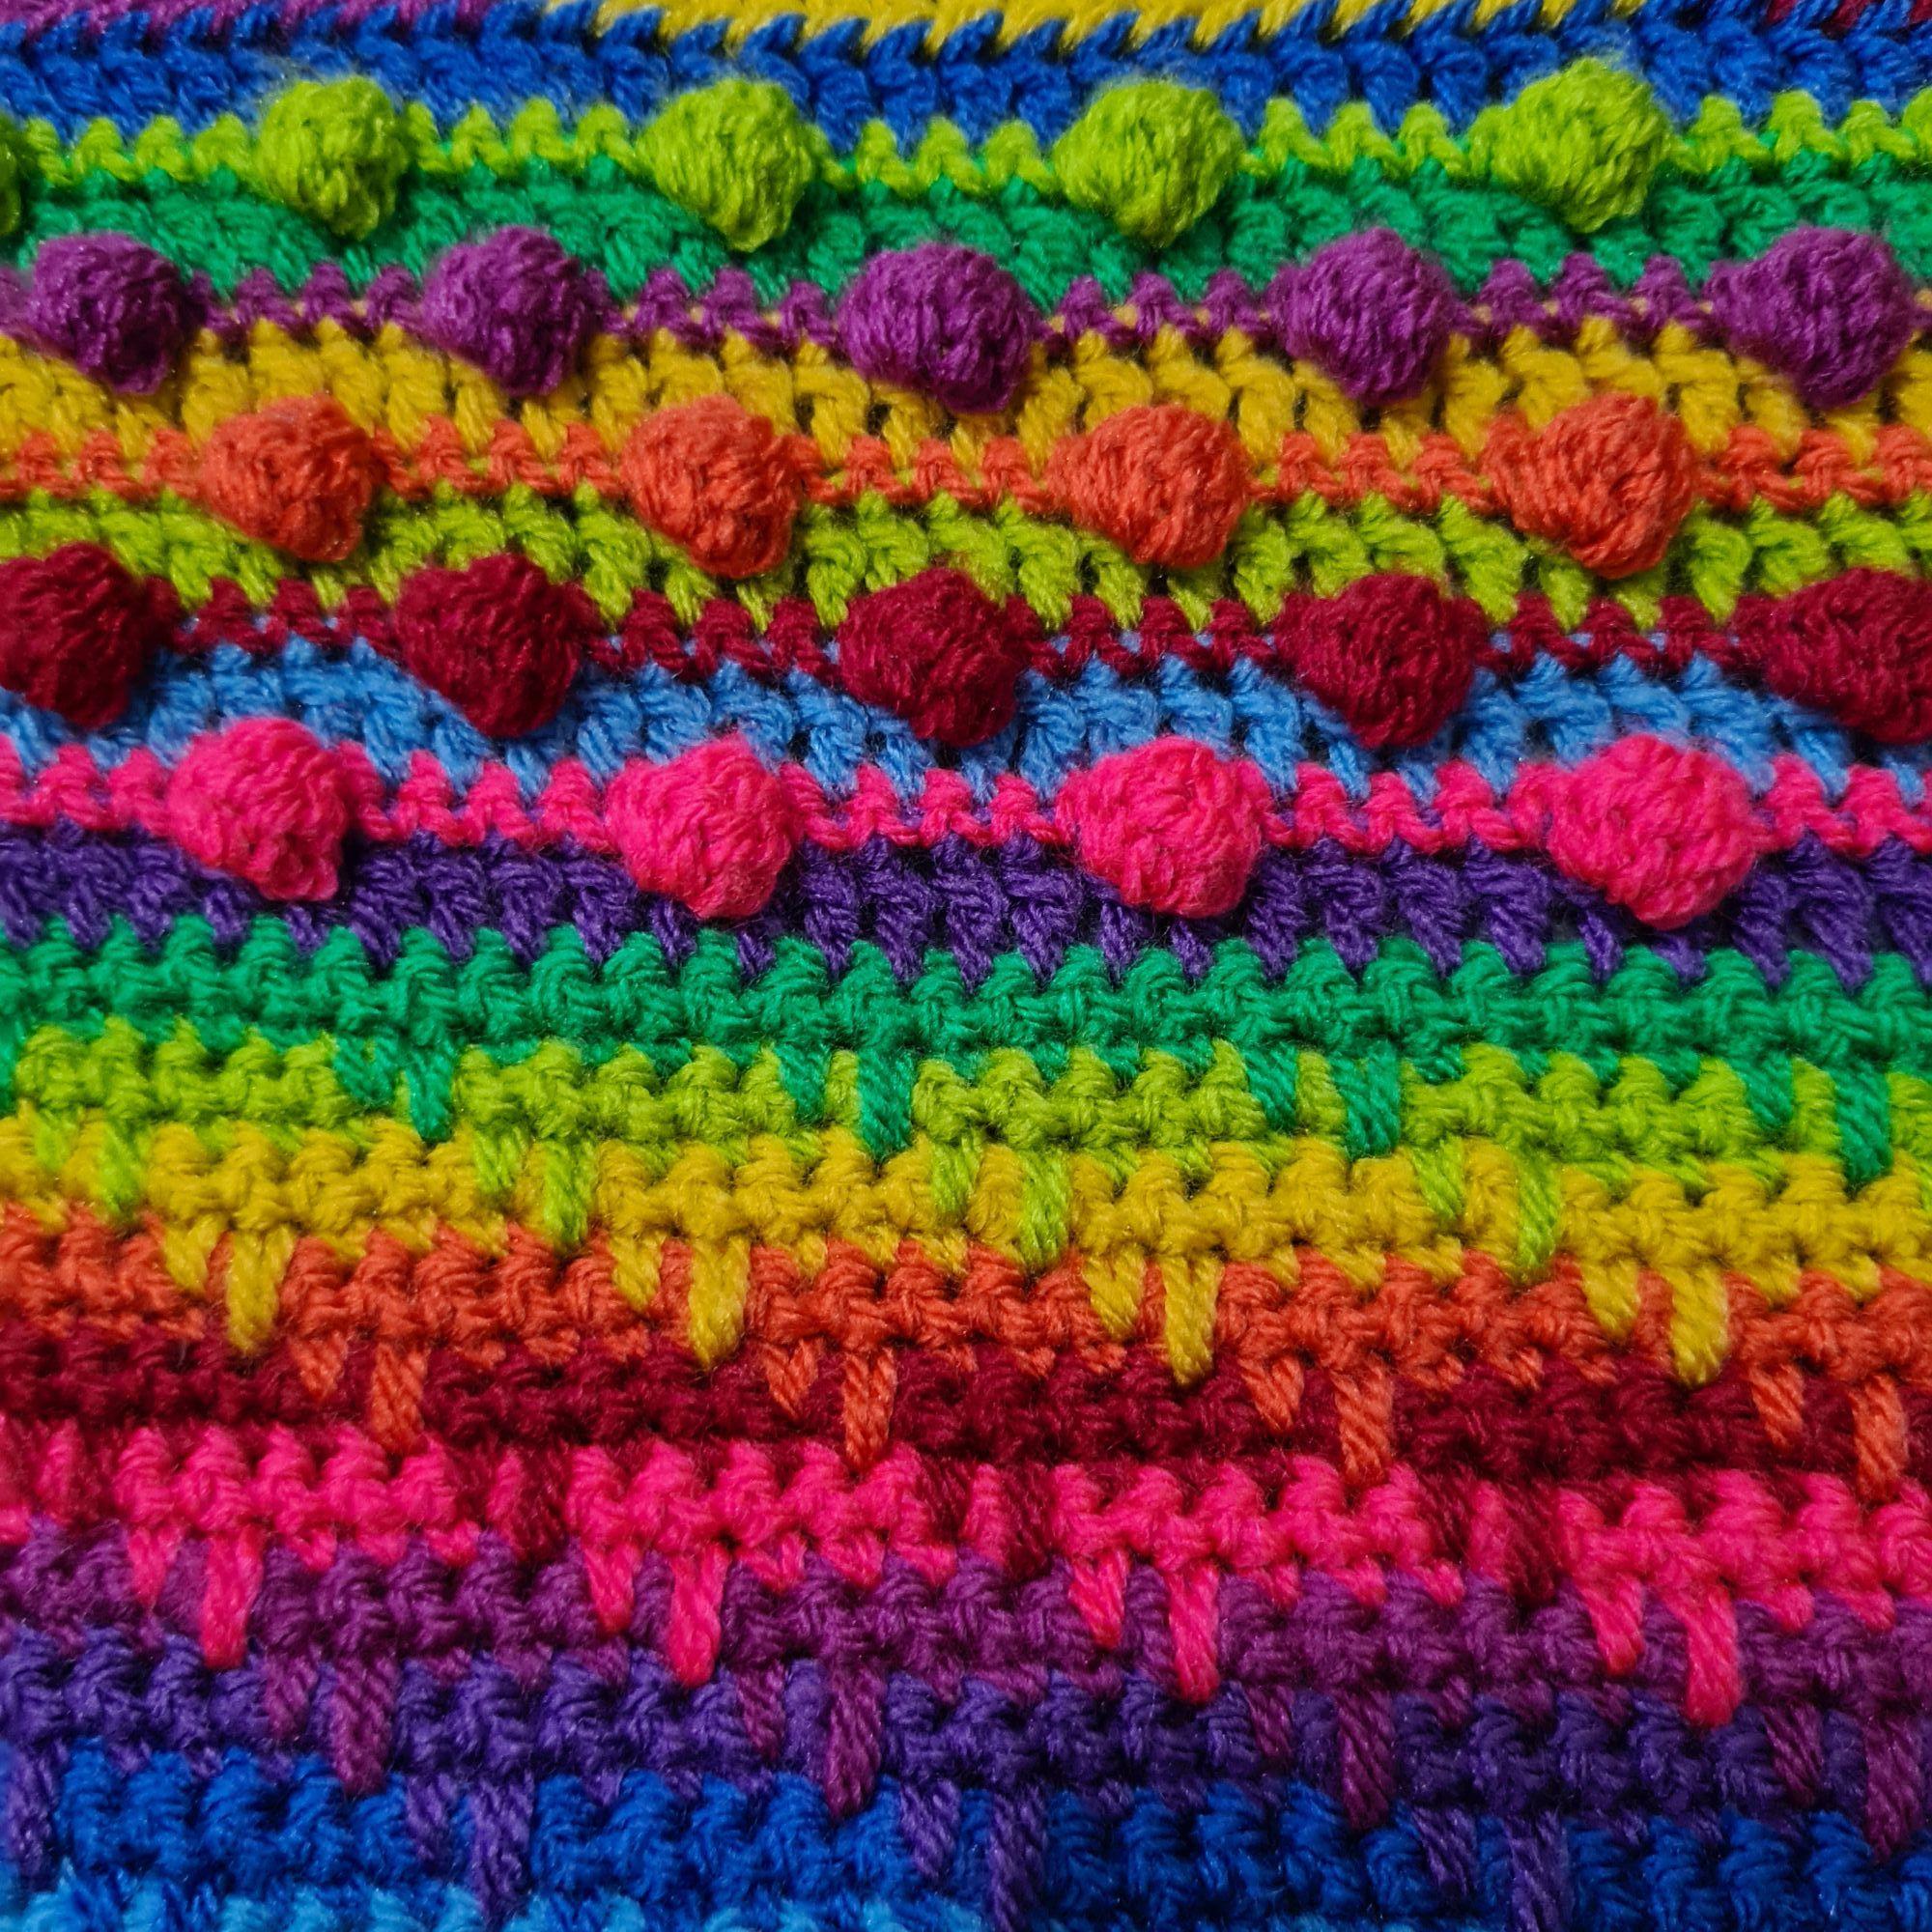 Diana Bensted - Crochet masterclass 3 Spike - 4 Bobbles